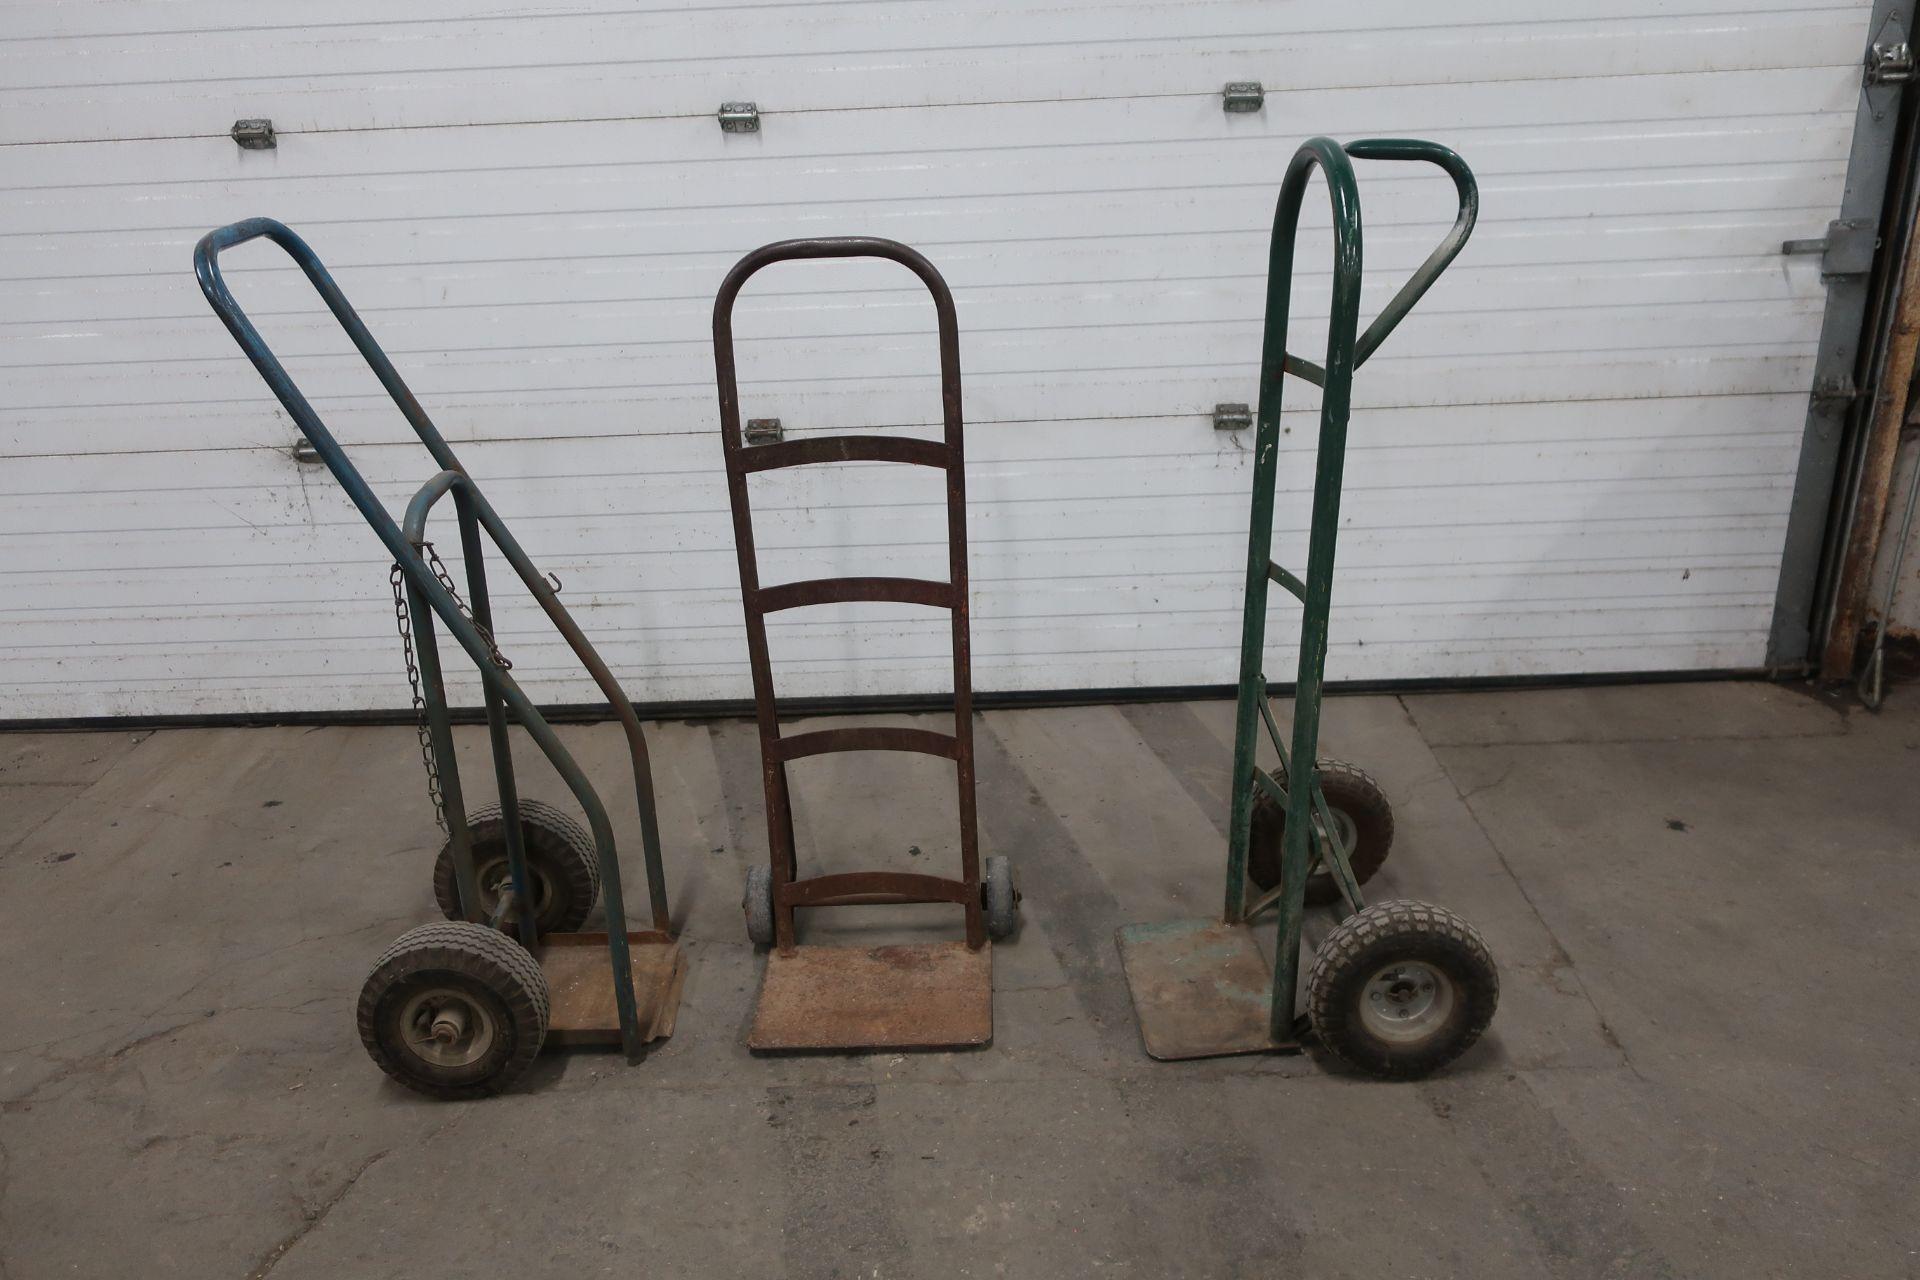 Lot of 3 (3 units) Dolley Shop Carts